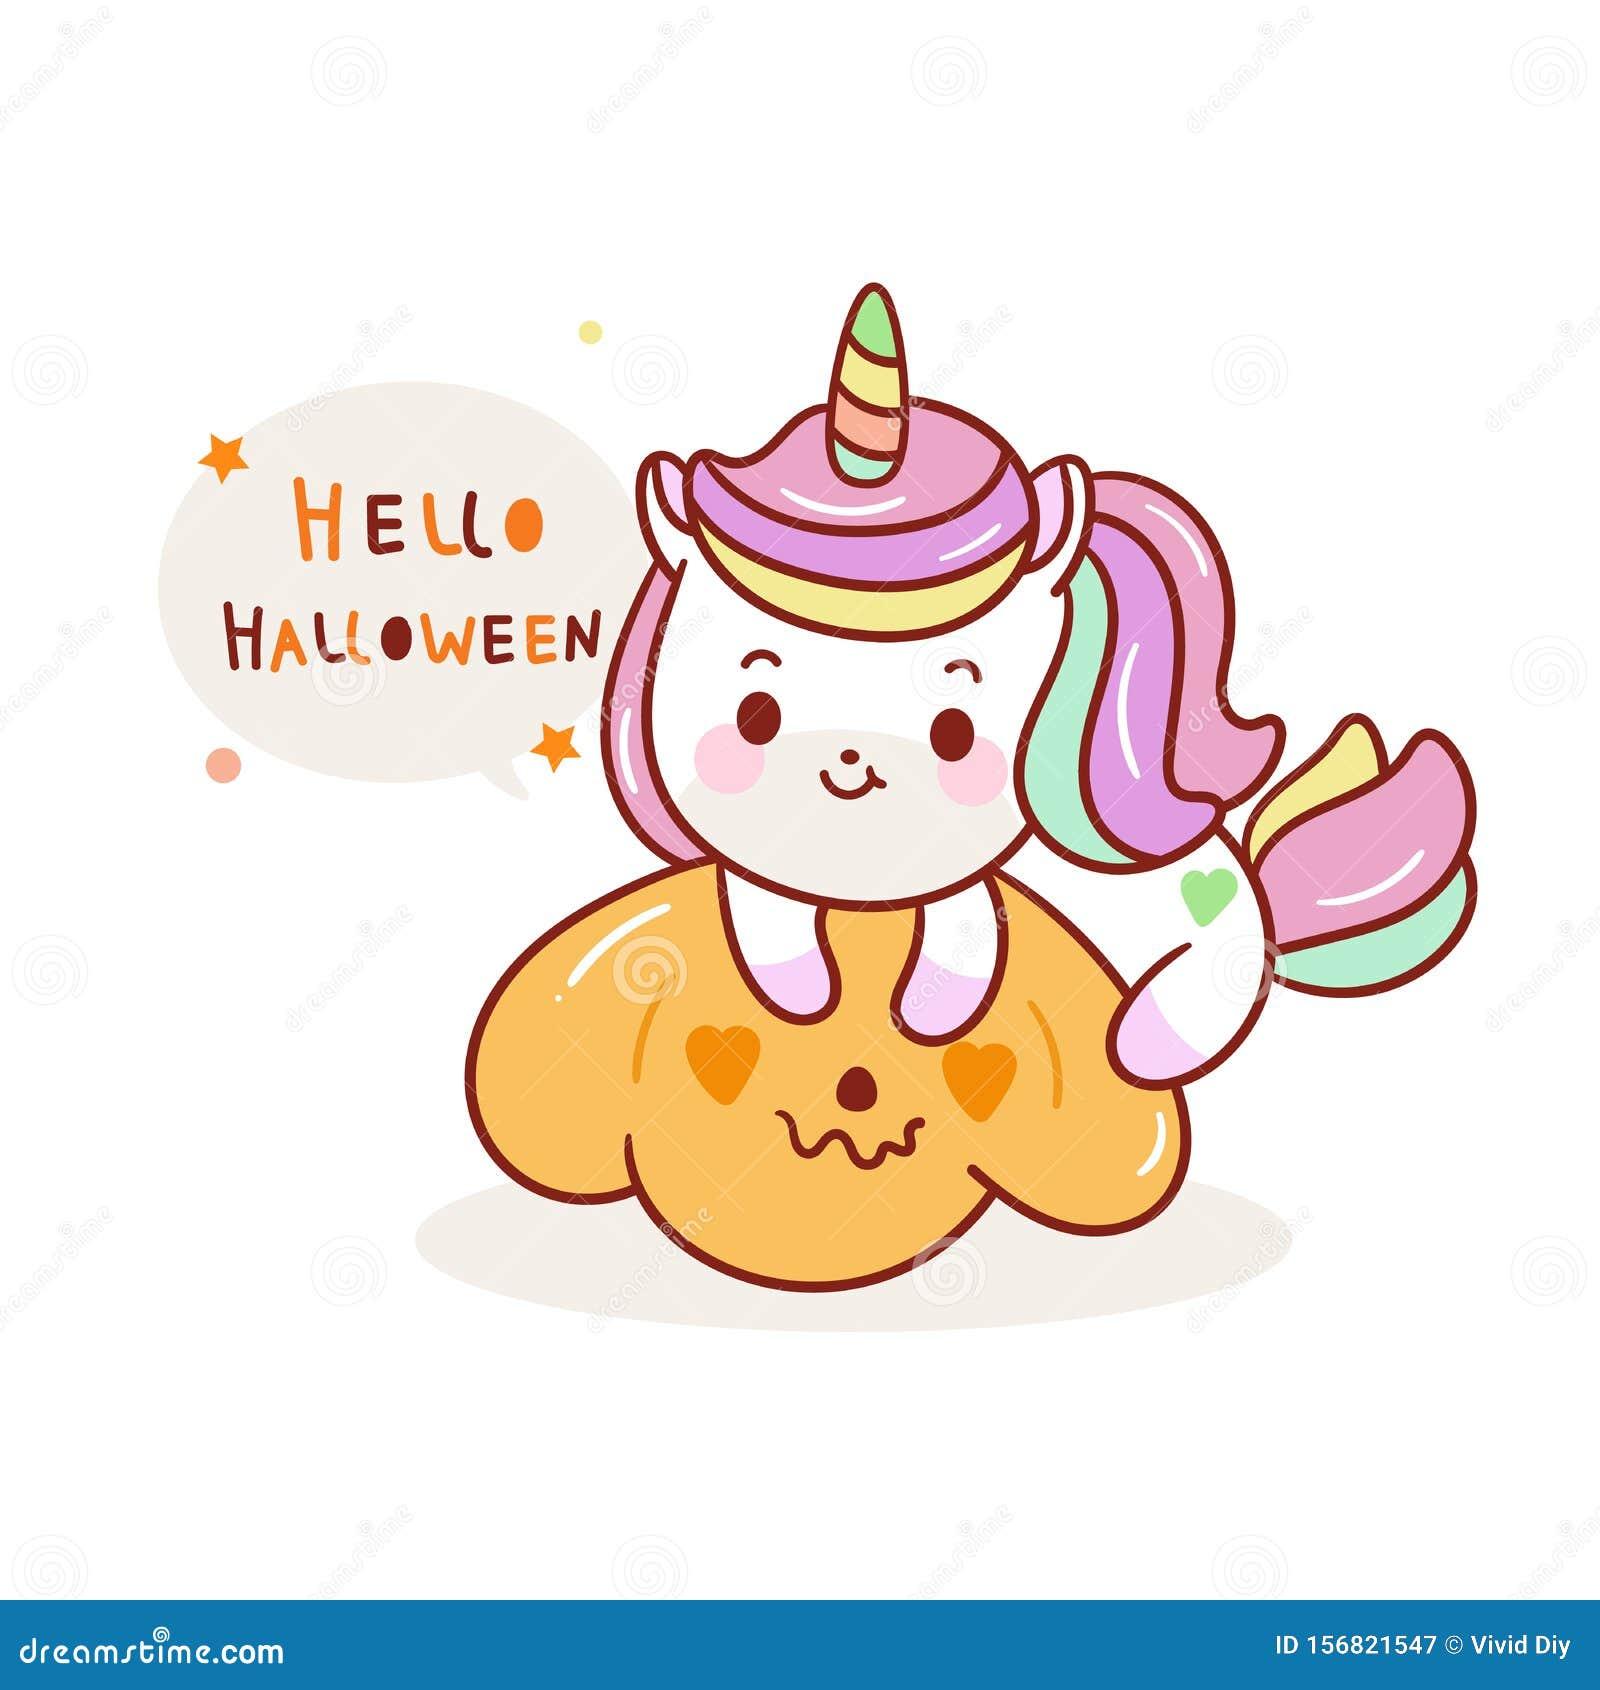 Cute Unicorn Halloween Vector Jack O Lantern Icons Pumpkin Artwork Kawaii Animal Pony Cartoon Stock Vector Illustration Of Birthday Beautiful 156821547